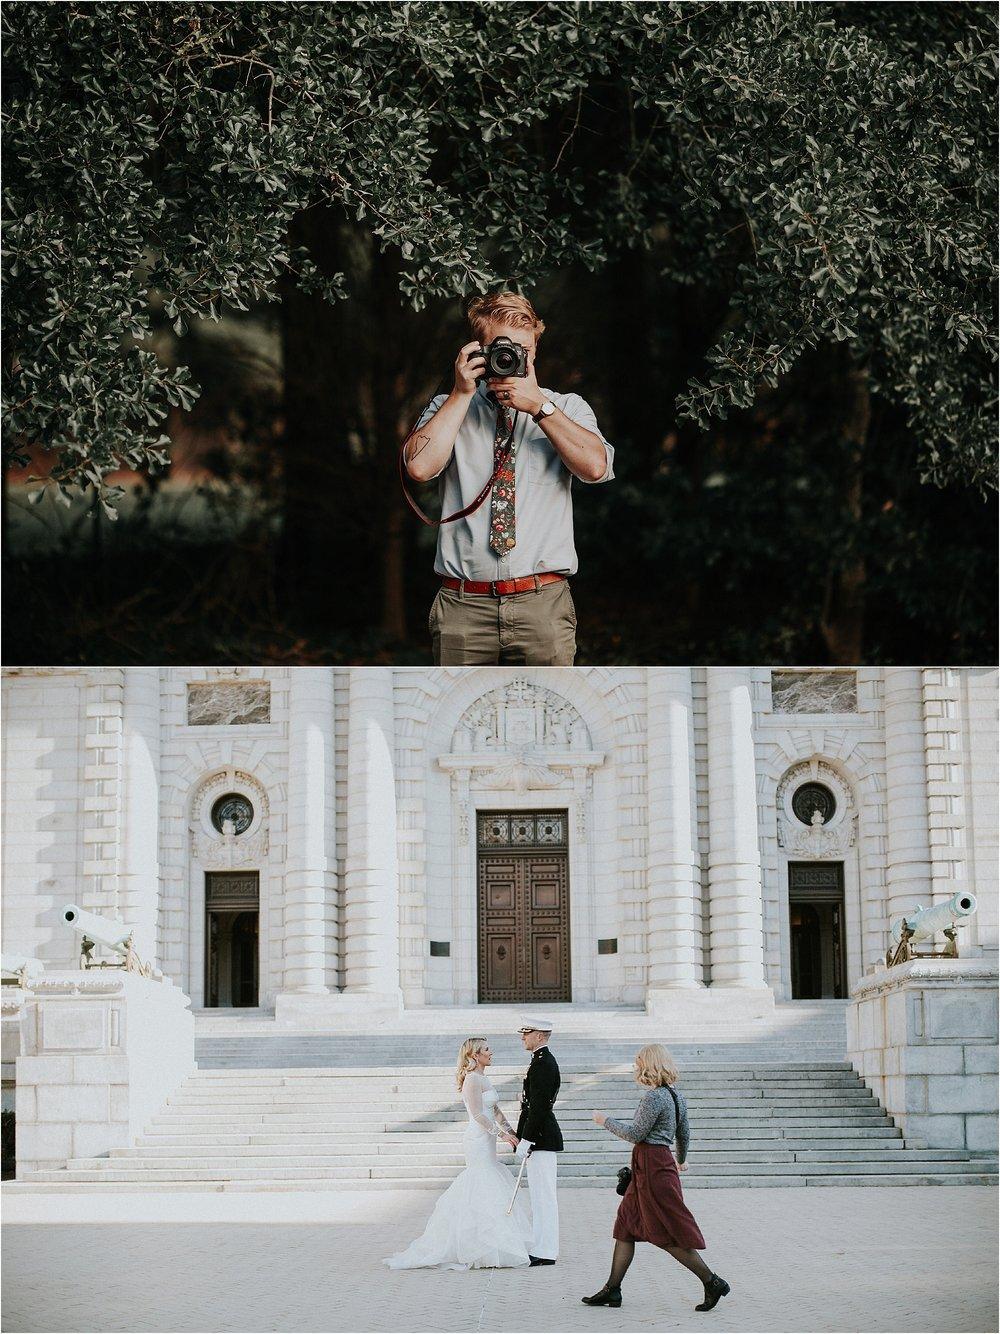 Sarah_Brookhart_PA_MD_Wedding_Photographer_0002.jpg